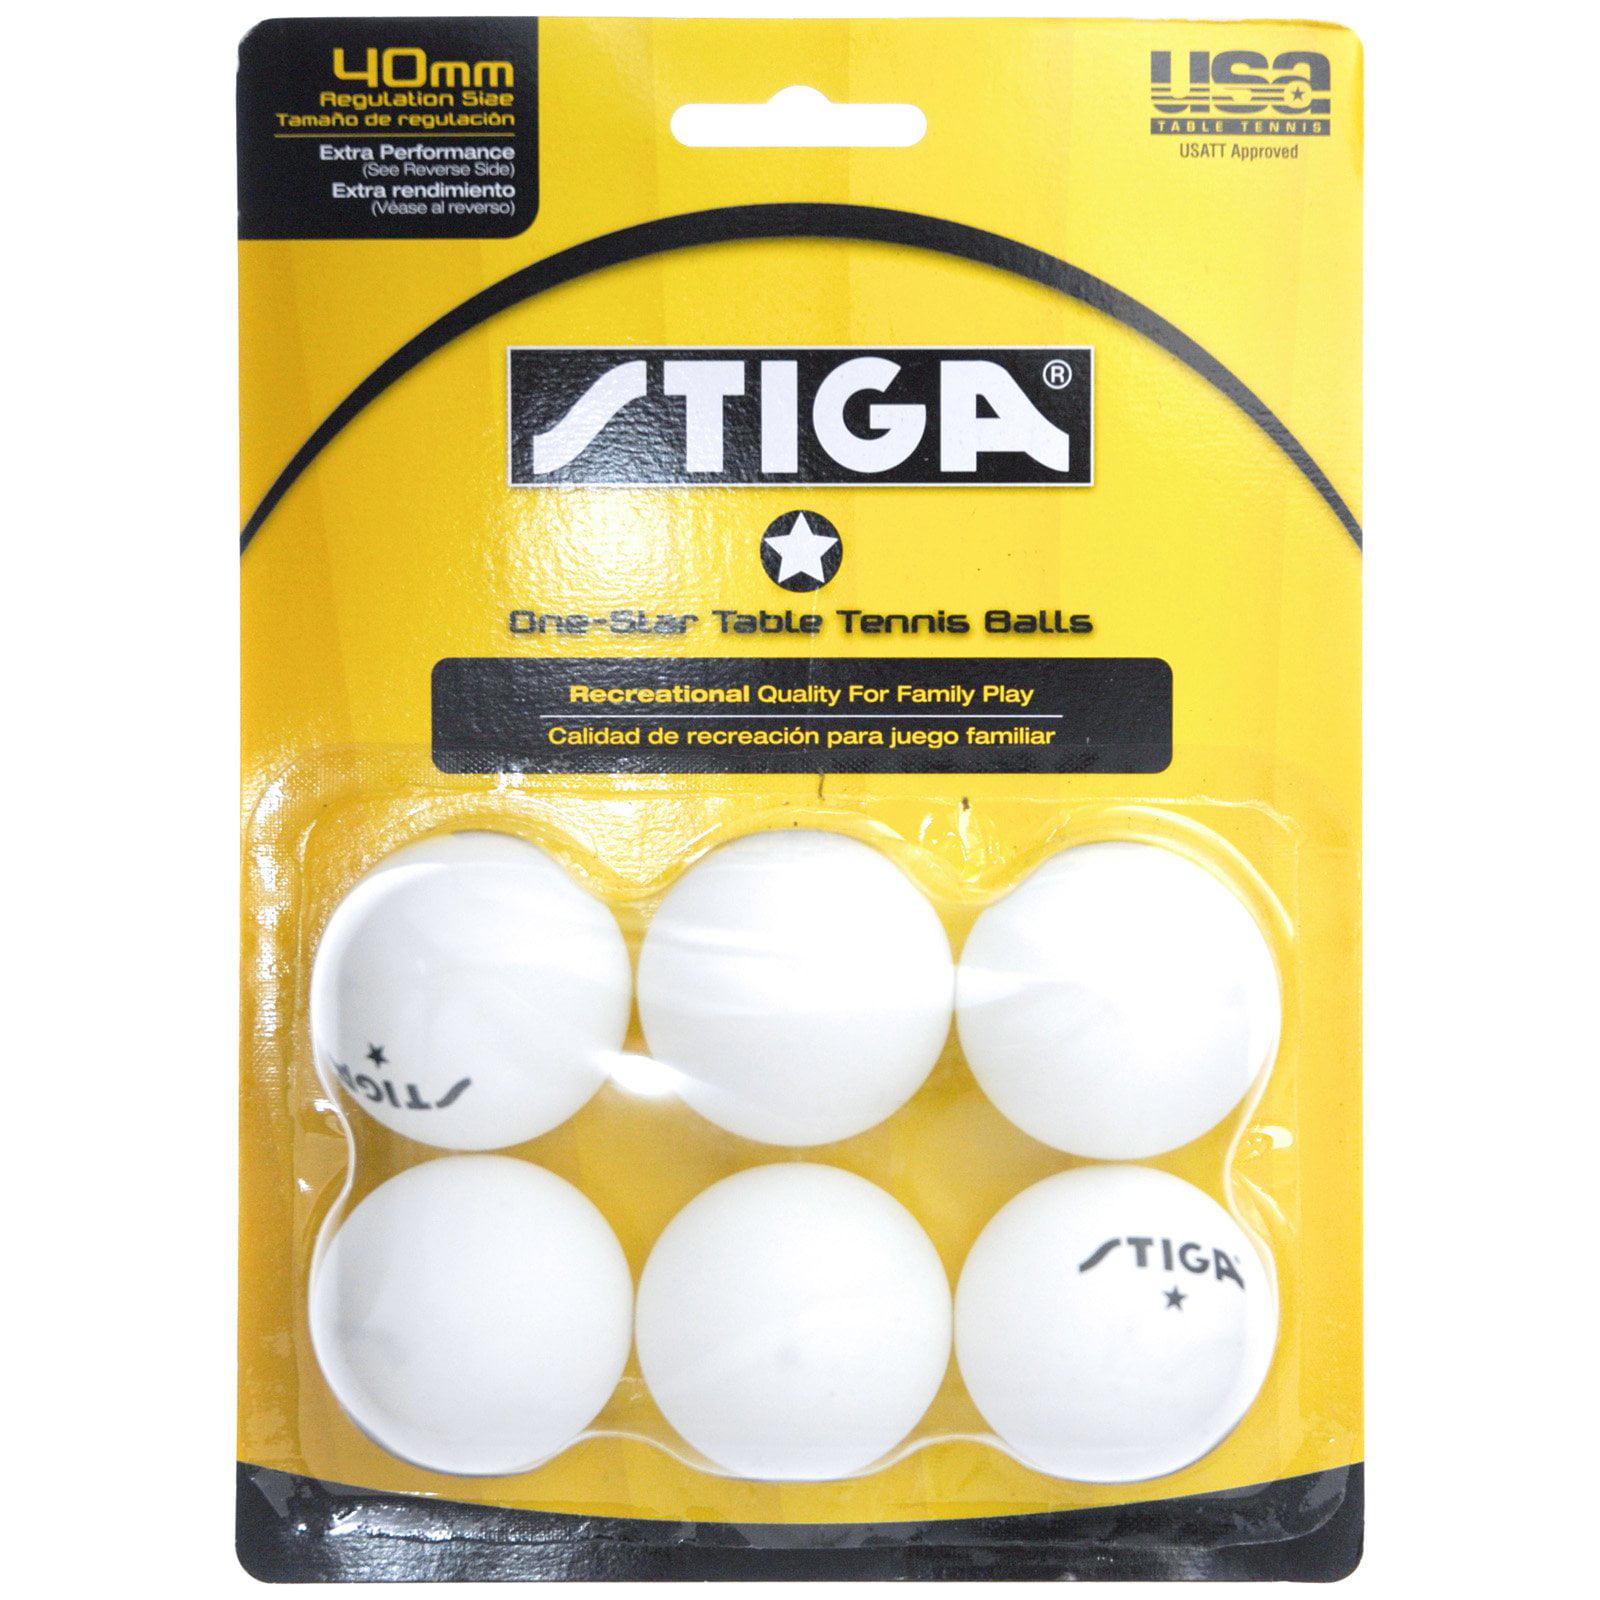 One-Star White Table Tennis Balls - Set of 6